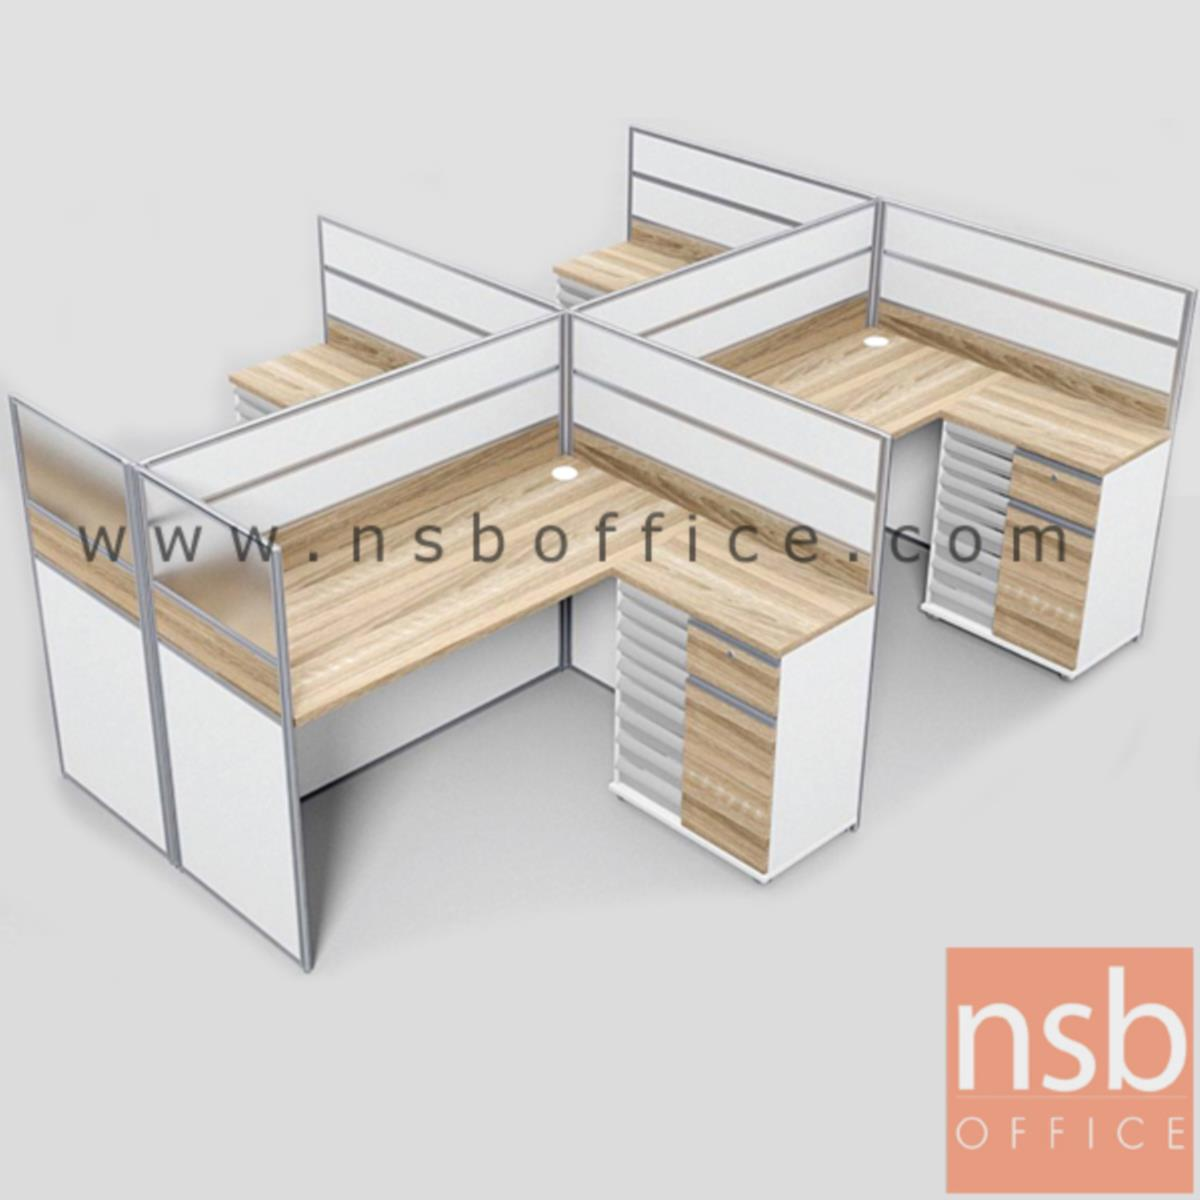 A04A181:ชุดโต๊ะทำงานกลุ่มตัวแอล 4 ที่นั่ง   ขนาดรวม 306W1*242W2 cm.